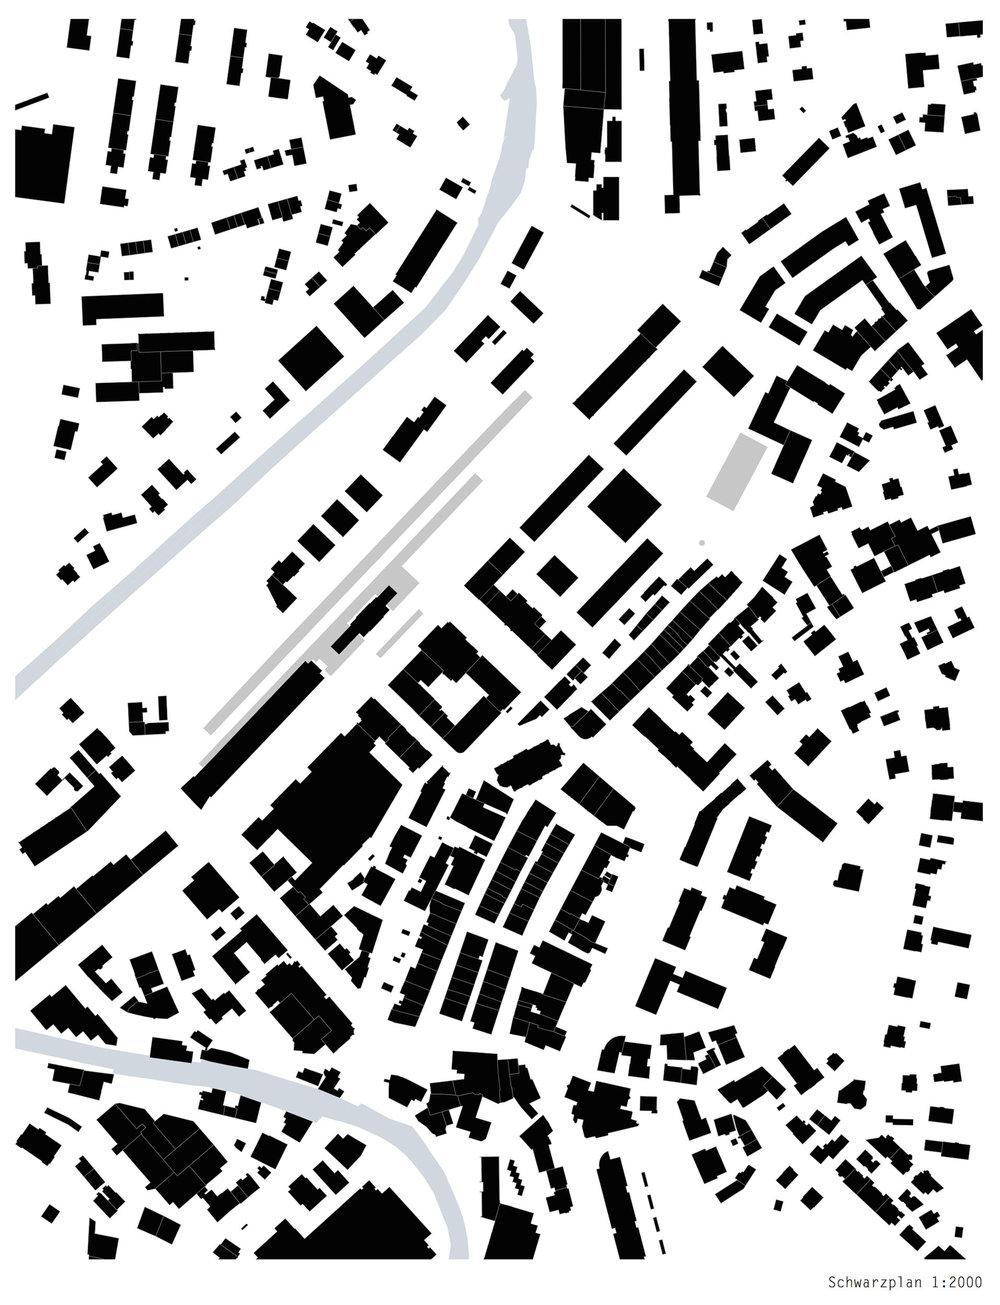 frauenfeld schwarzplan